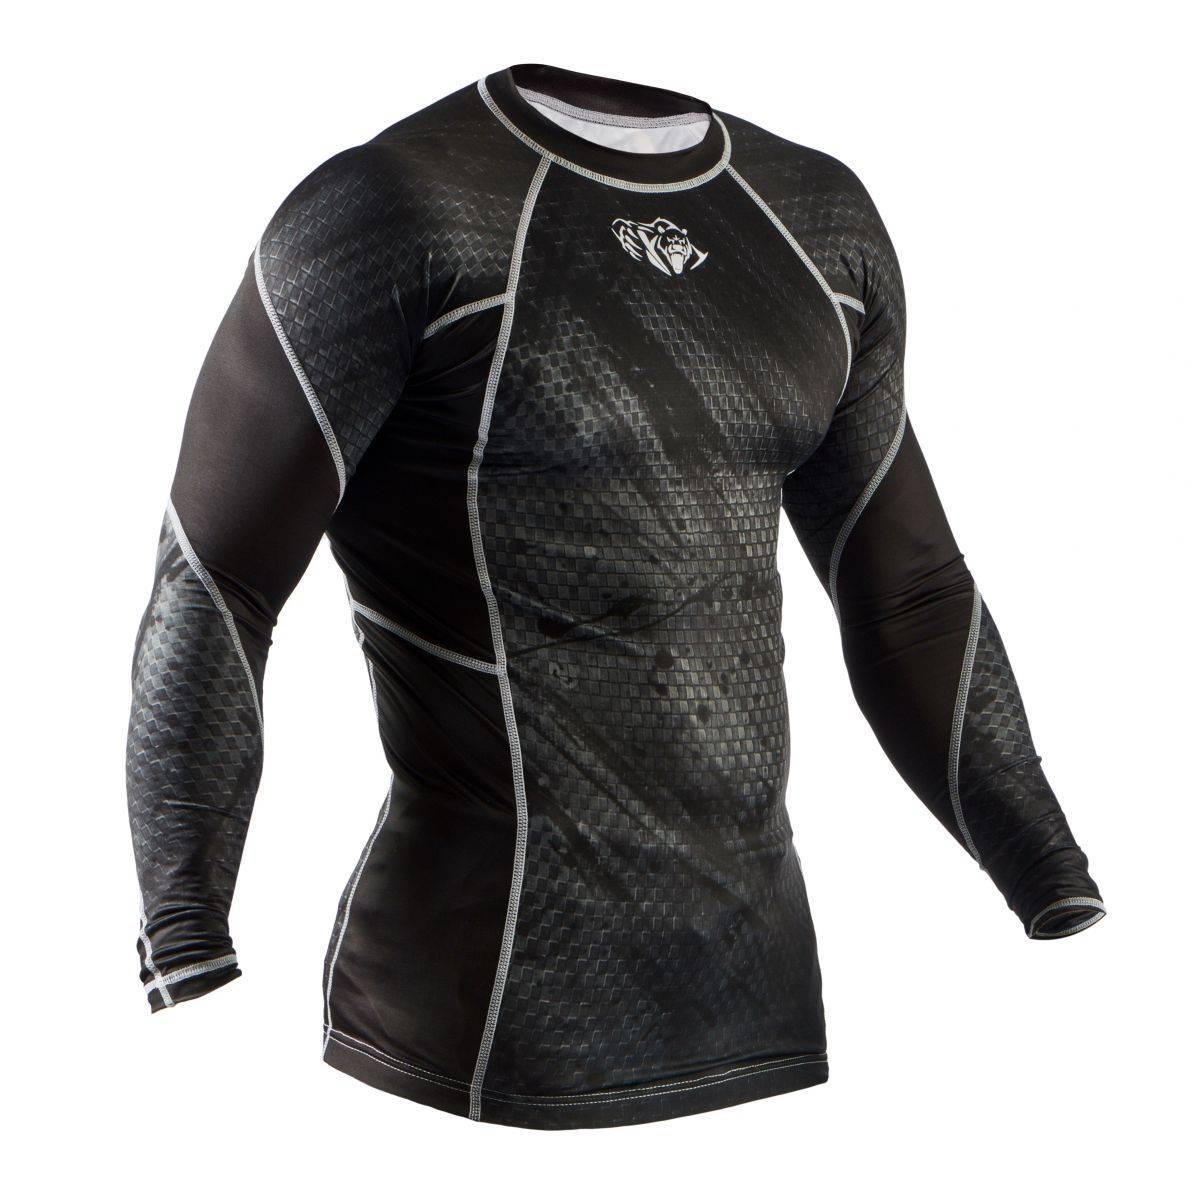 Компрессионная кофта Peresvit Immortal Silver Force Black-S